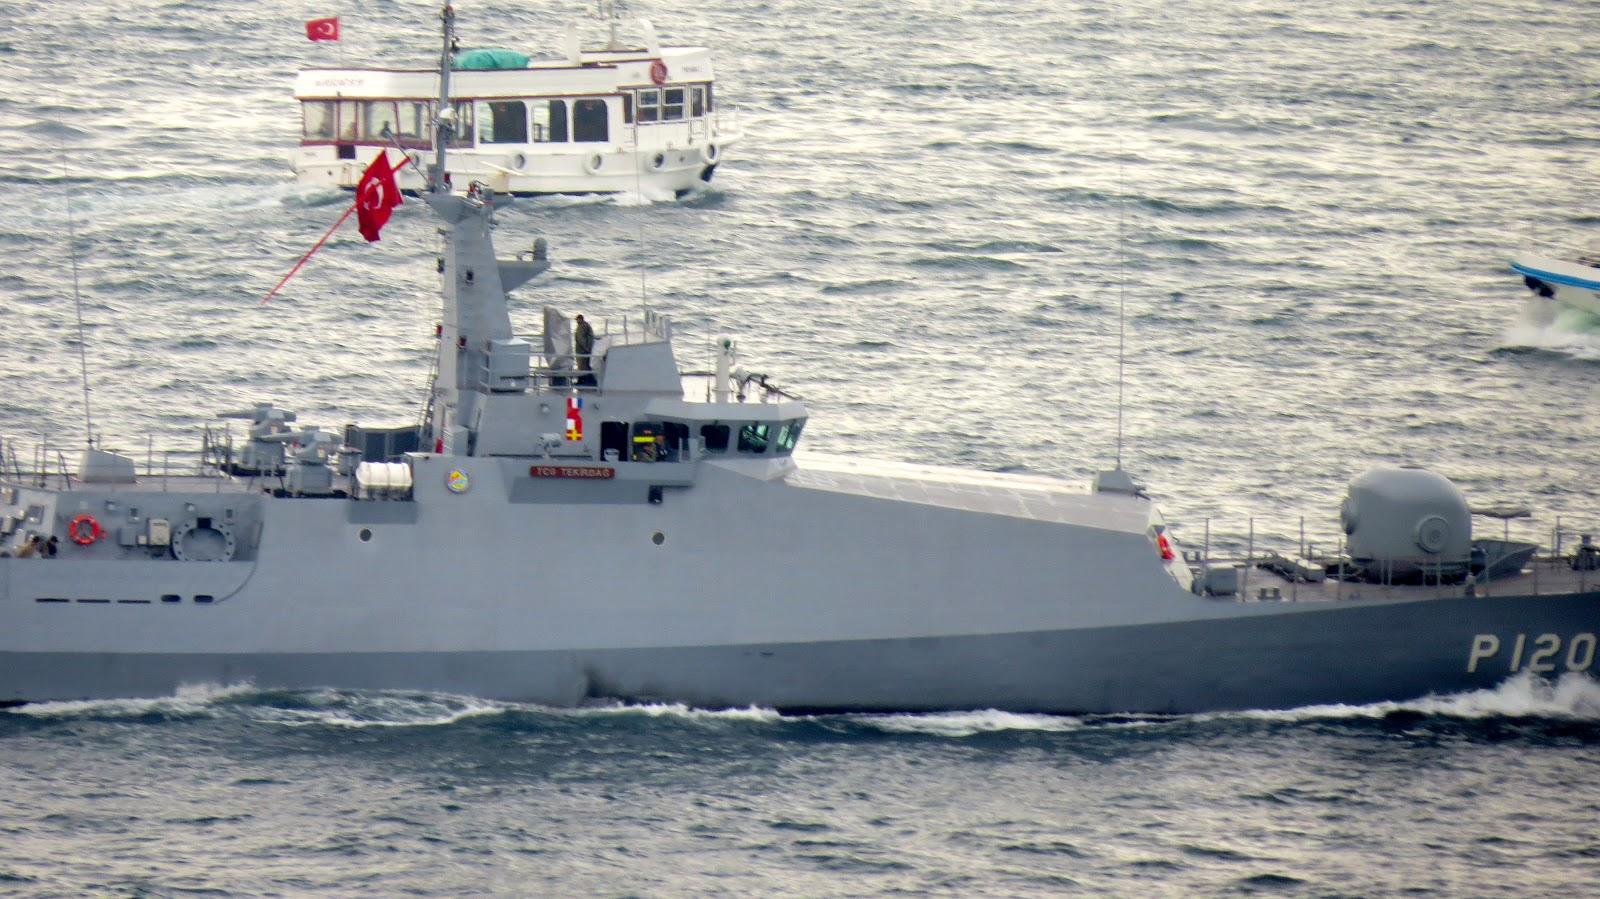 Unidades que pudiera poseer la Armada - Página 21 P+1207+TEKIRDAG+,+TUZLA+CLASS